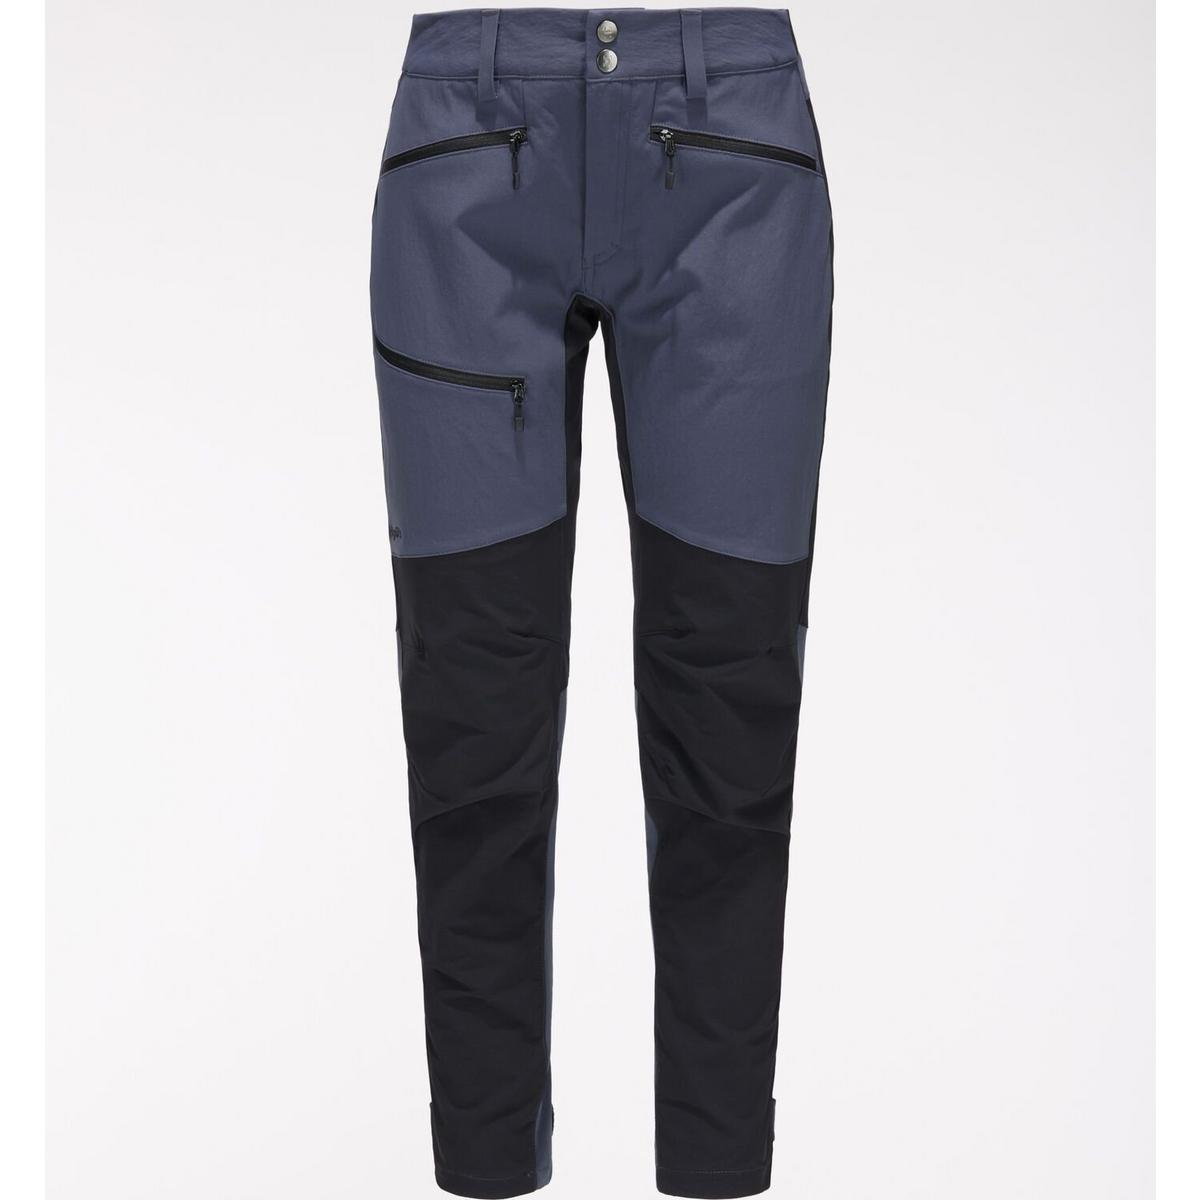 Haglofs Women's Rugged Flex Pant Regular- Dense Blue/ True Black